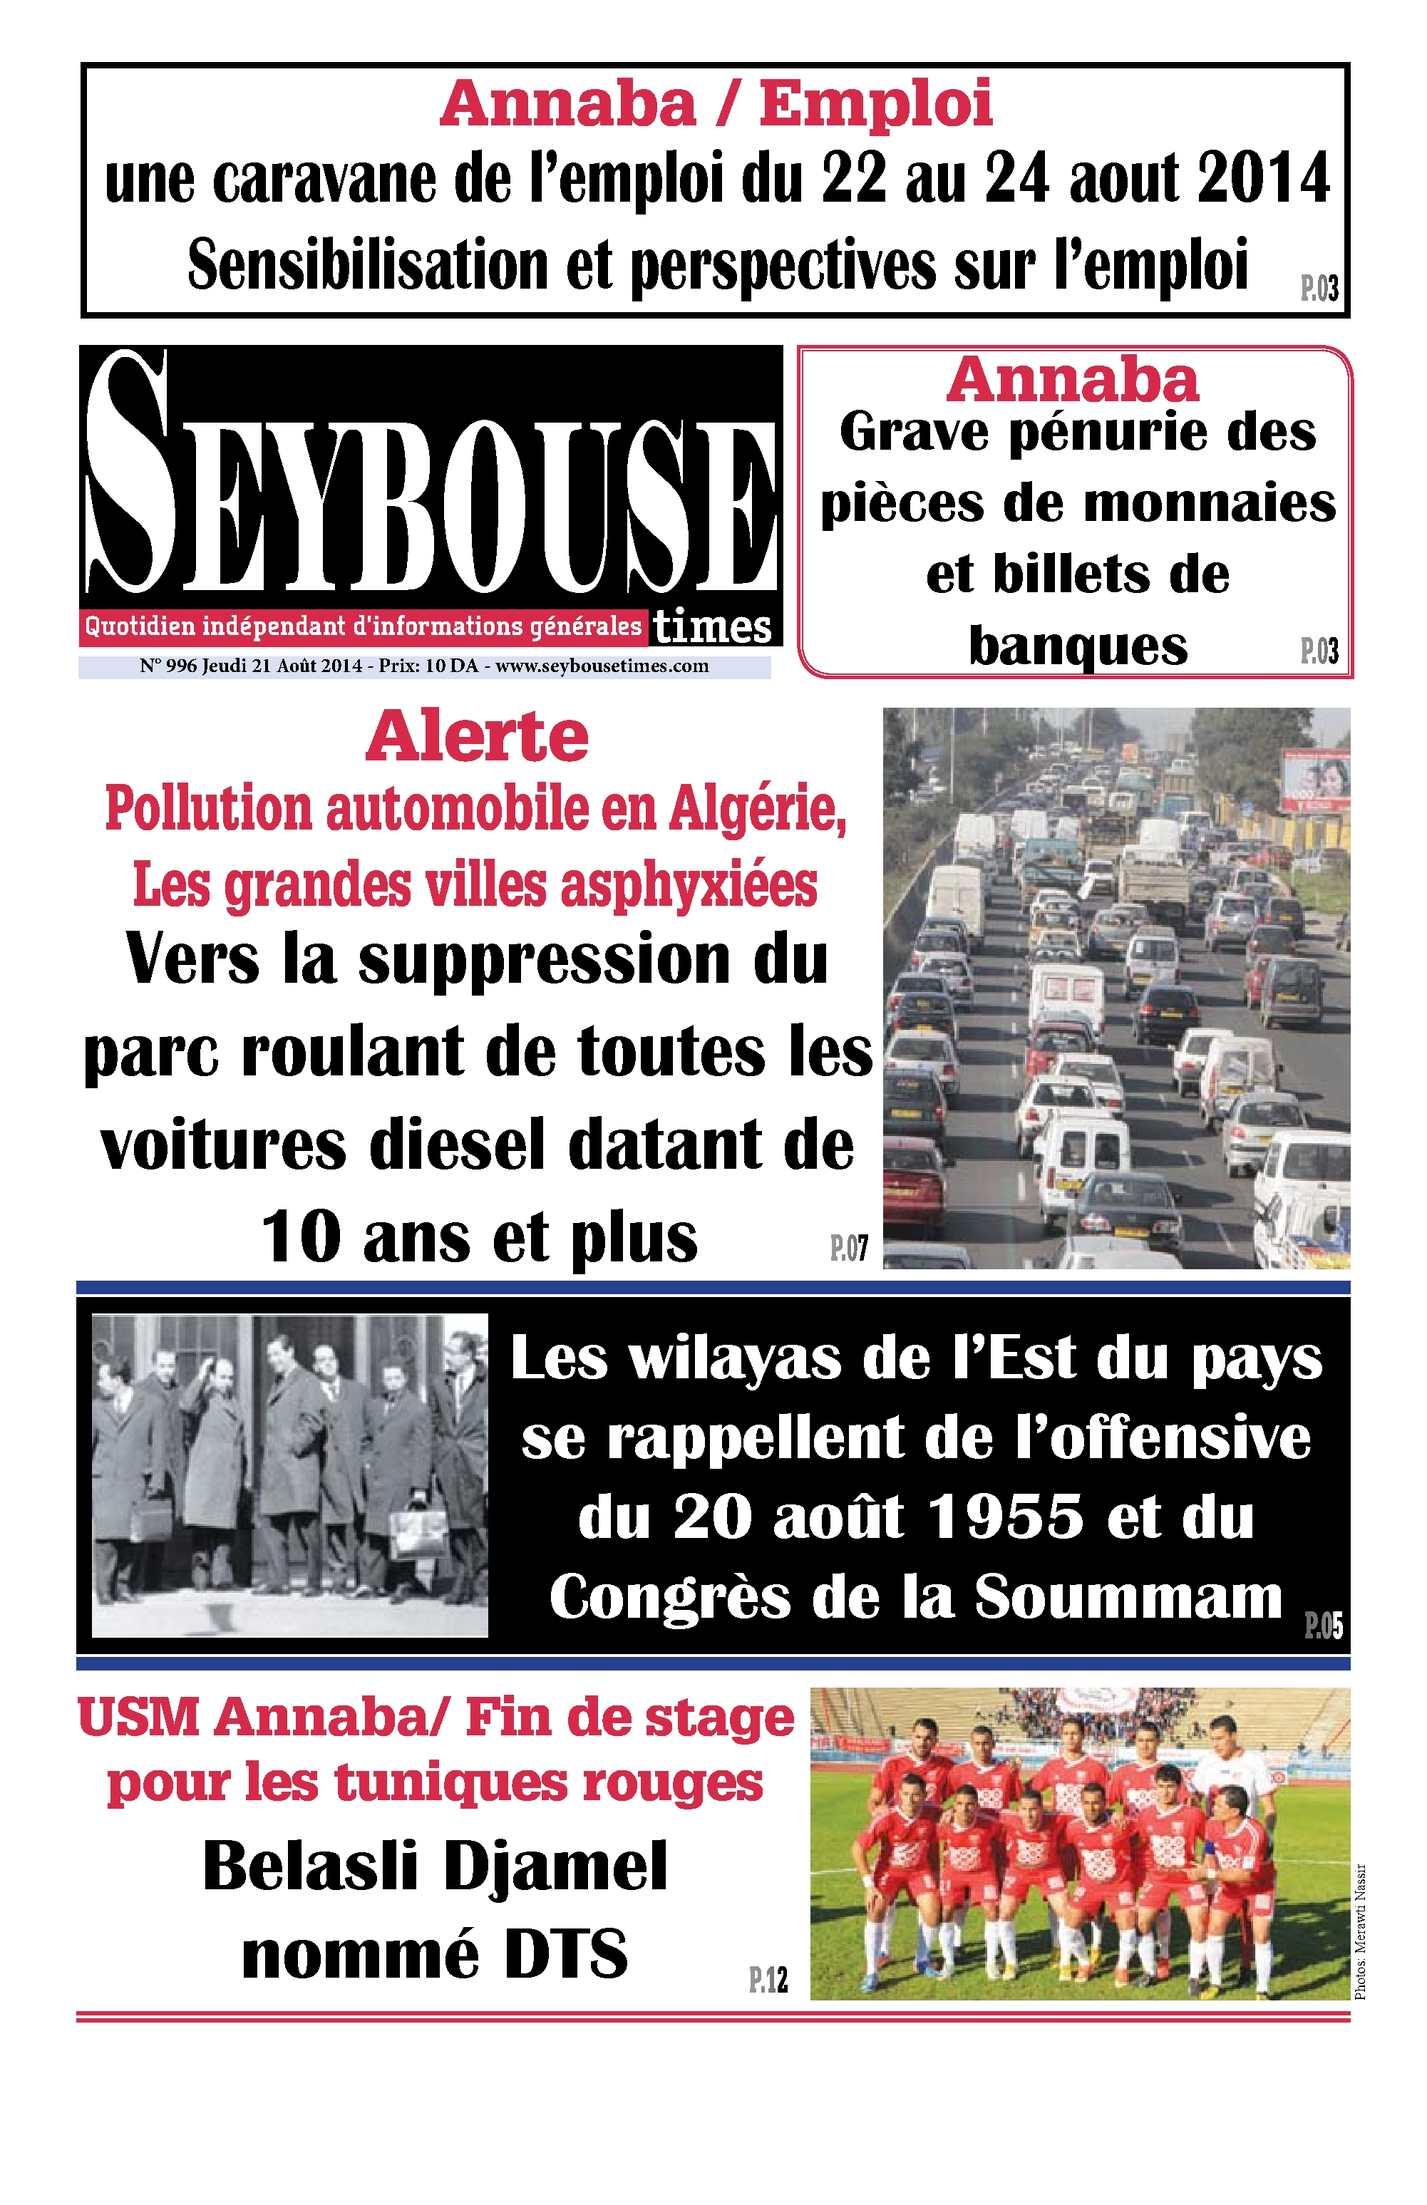 ba38b67dab7668 Calaméo - seybousetimes pdf E 996